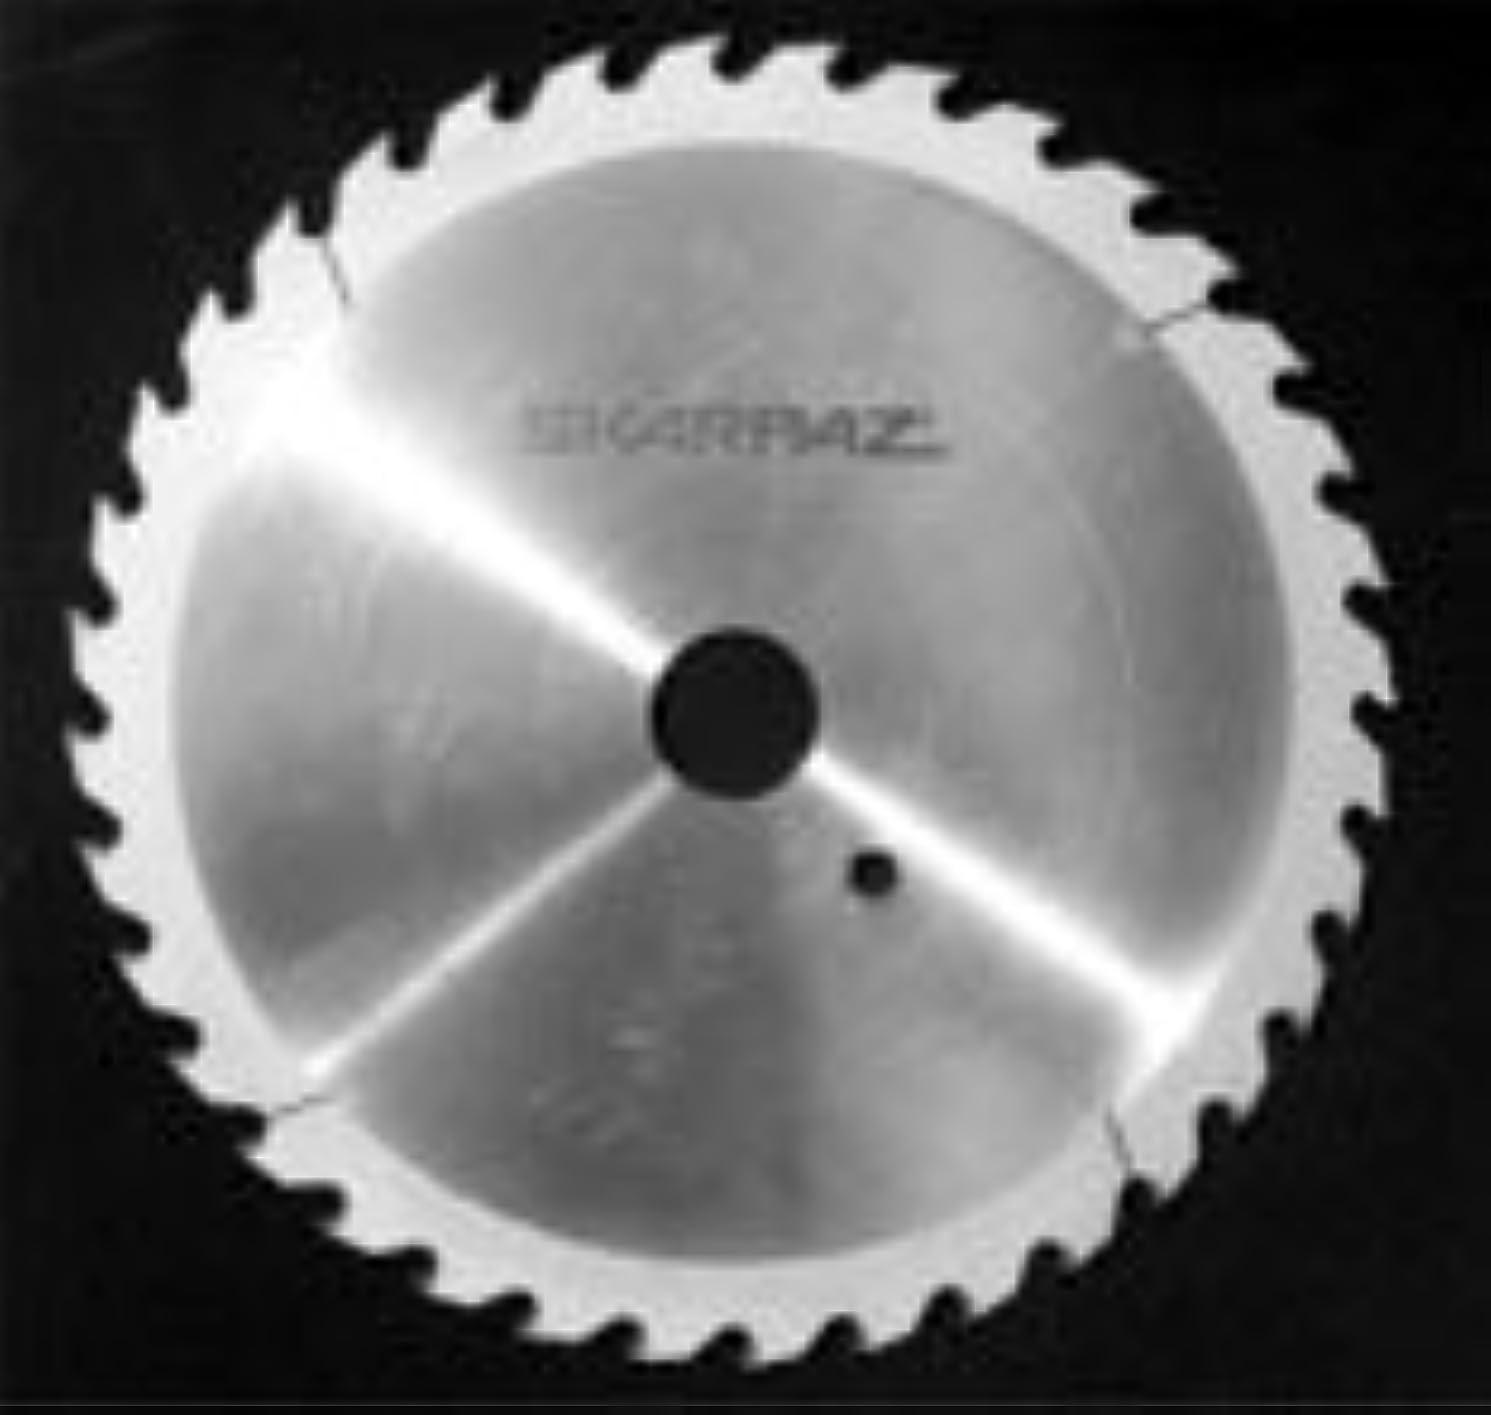 Skarpaz G1836T Glue Line Rip Saw Blades - 18